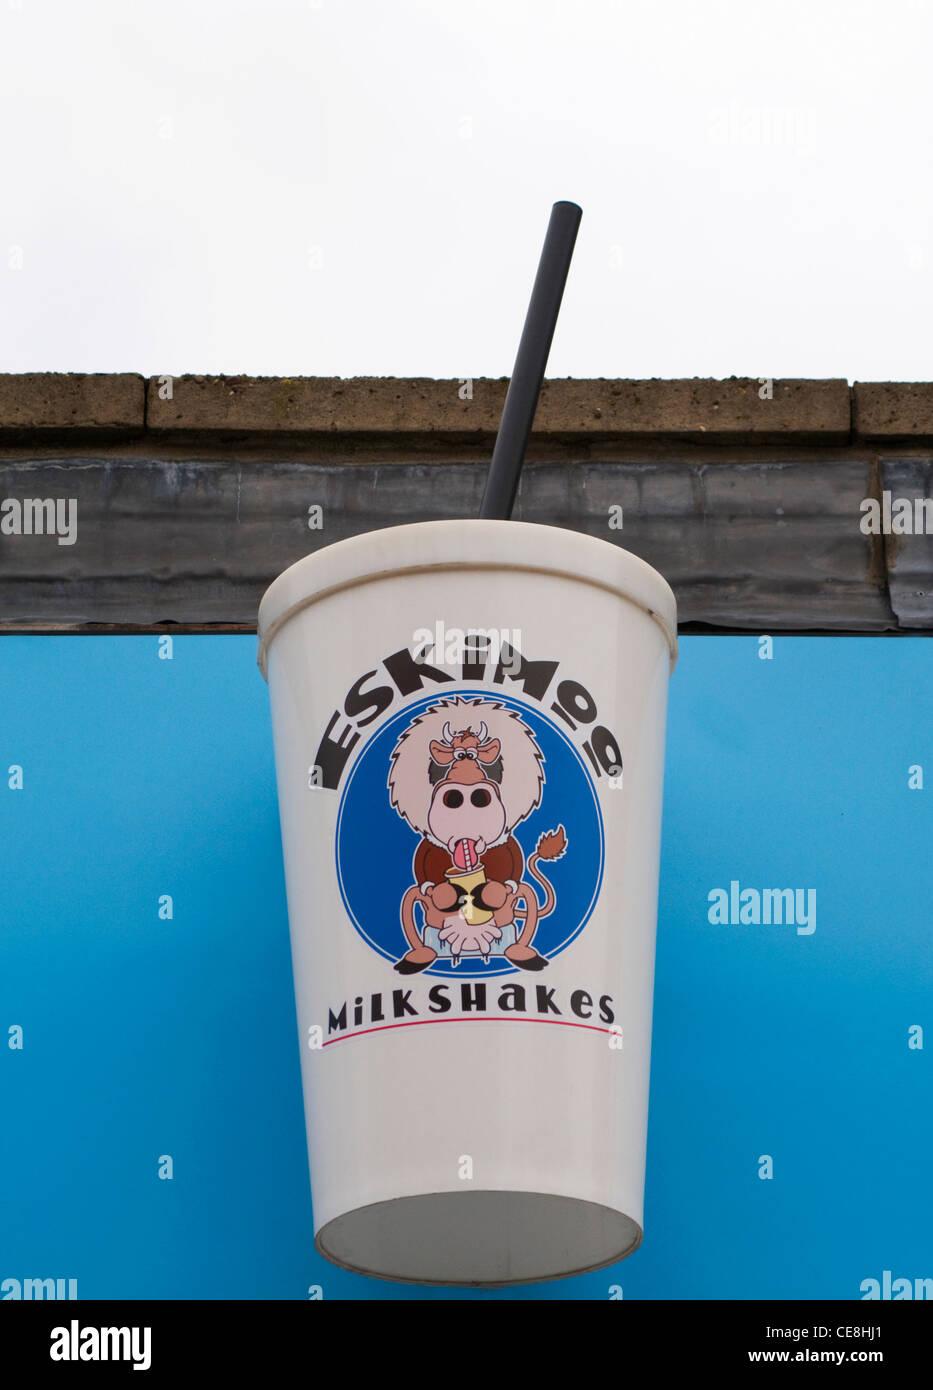 A big Eskimoo milkshake sign - Stock Image